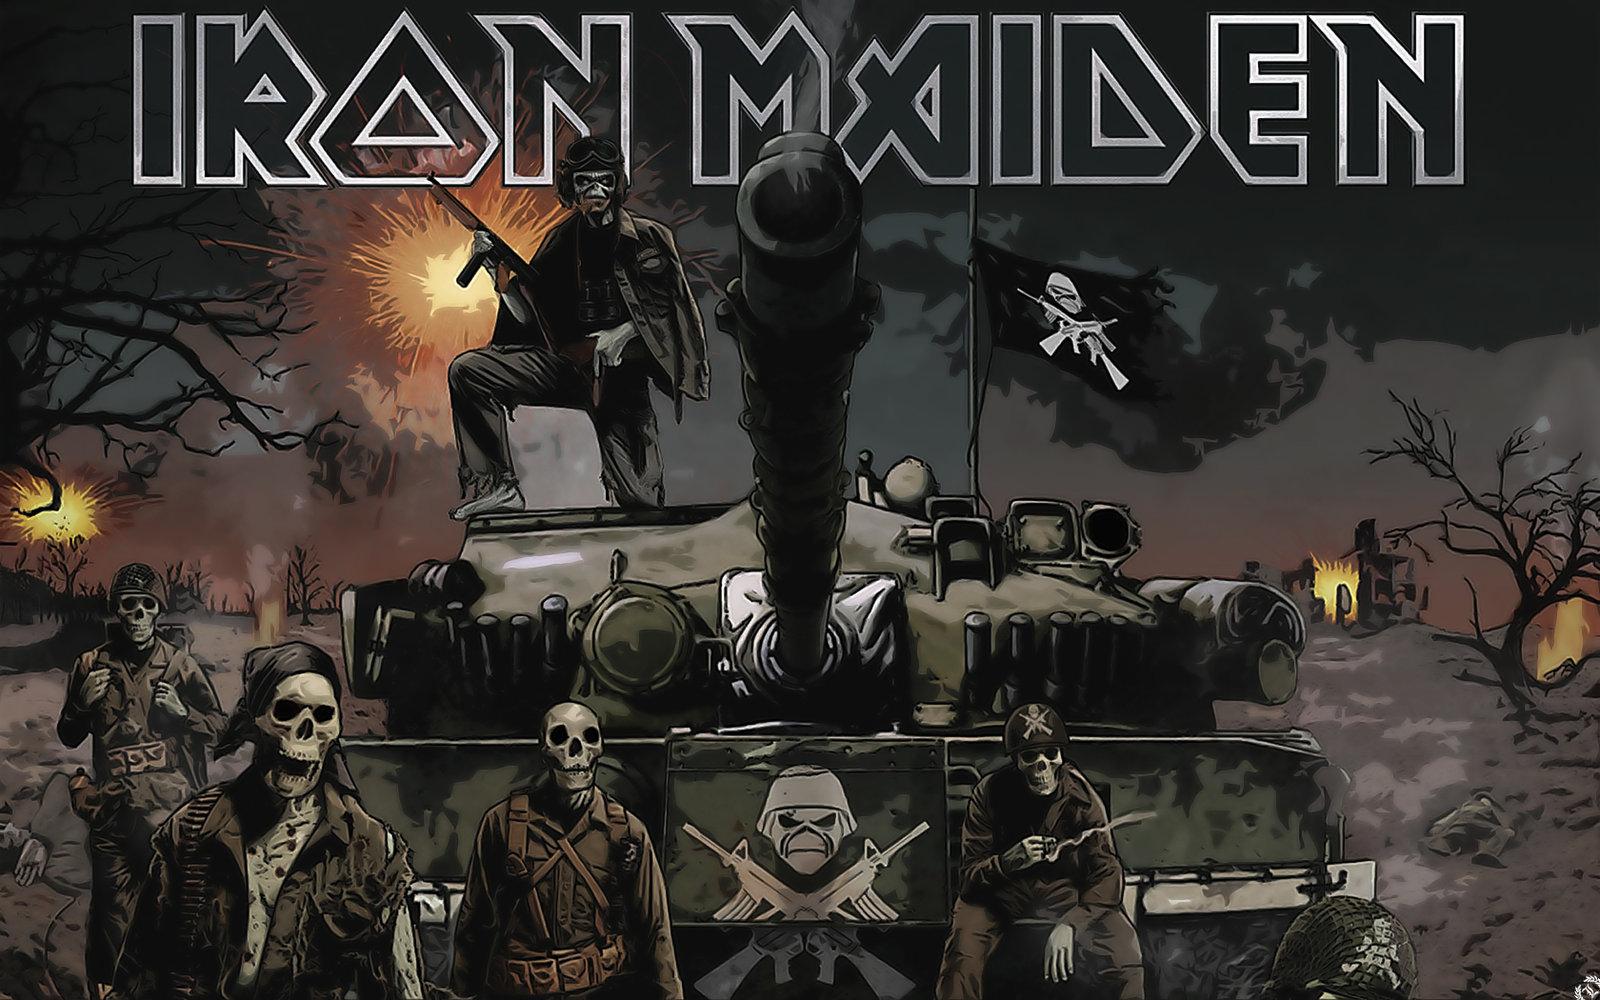 Iron Maiden Desktop Wallpaper: Iron Maiden Desktop Wallpapers